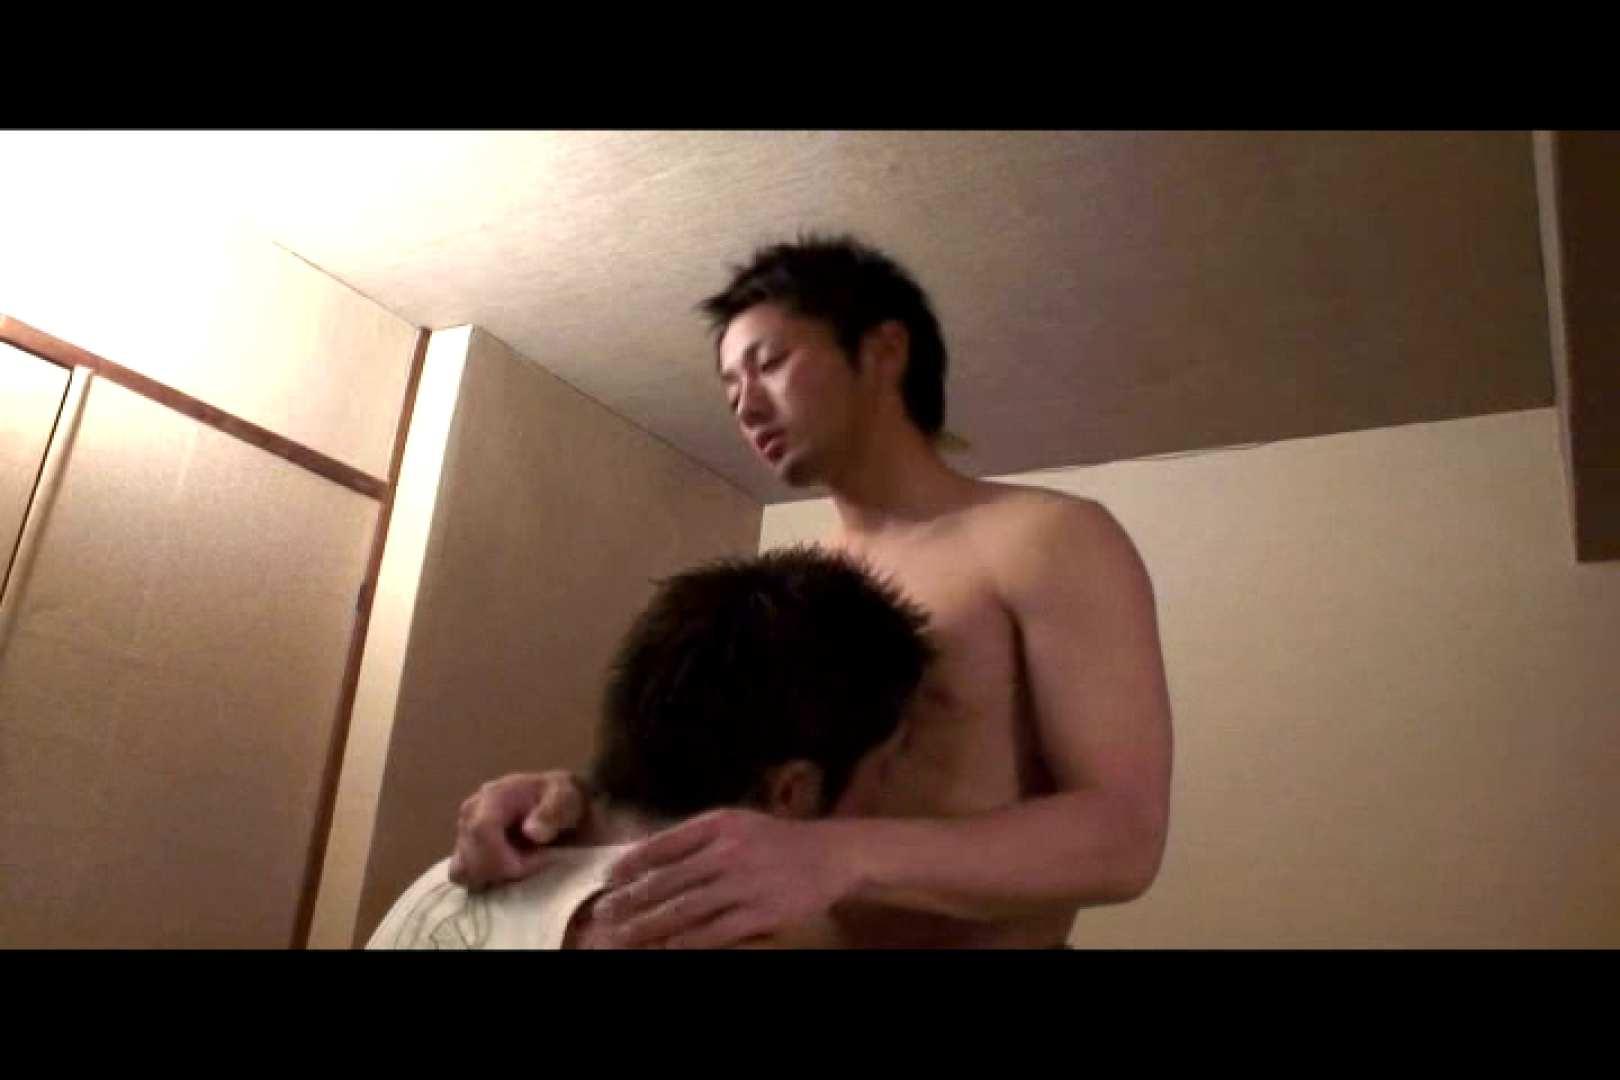 Bistro「イケメン」~Mokkori和風仕立て~vol.01 ゲイのプレイ | イケメンたち  97枚 73